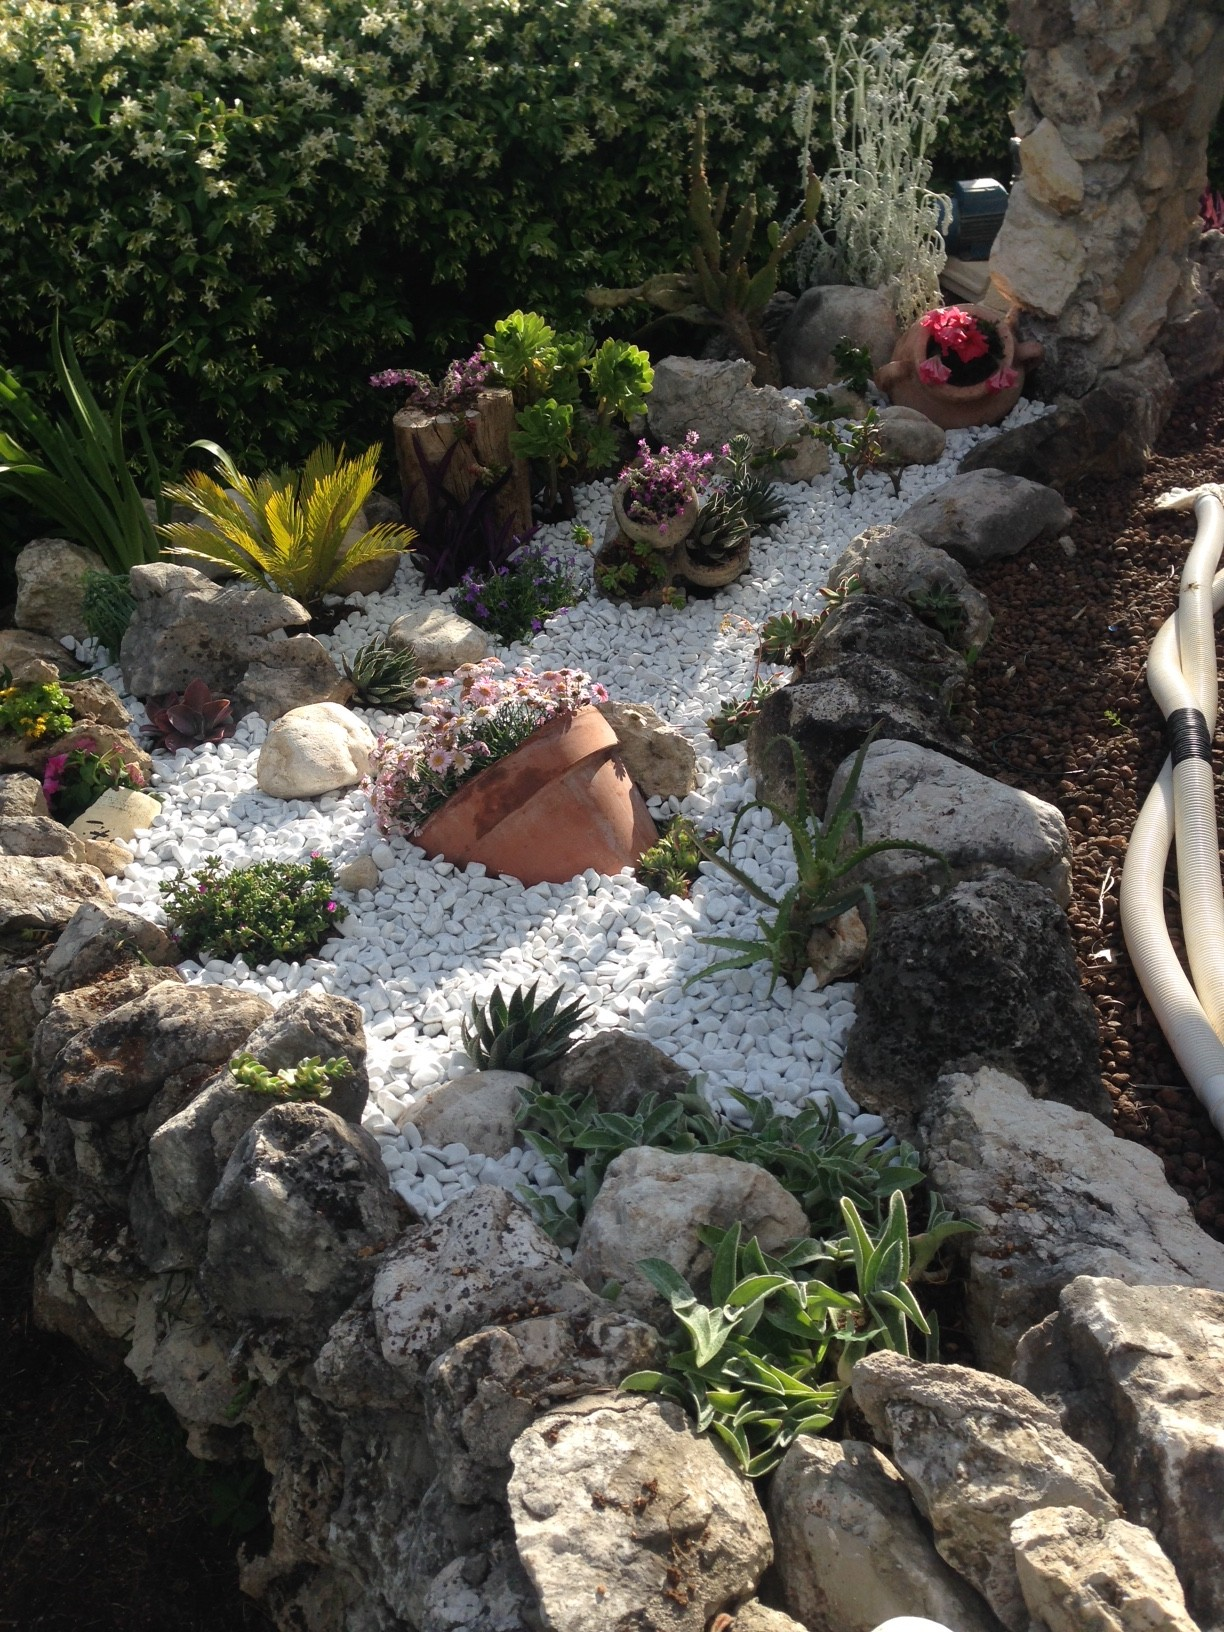 Aiuole creative ecco 20 bellissime idee - Aiuole per giardino ...